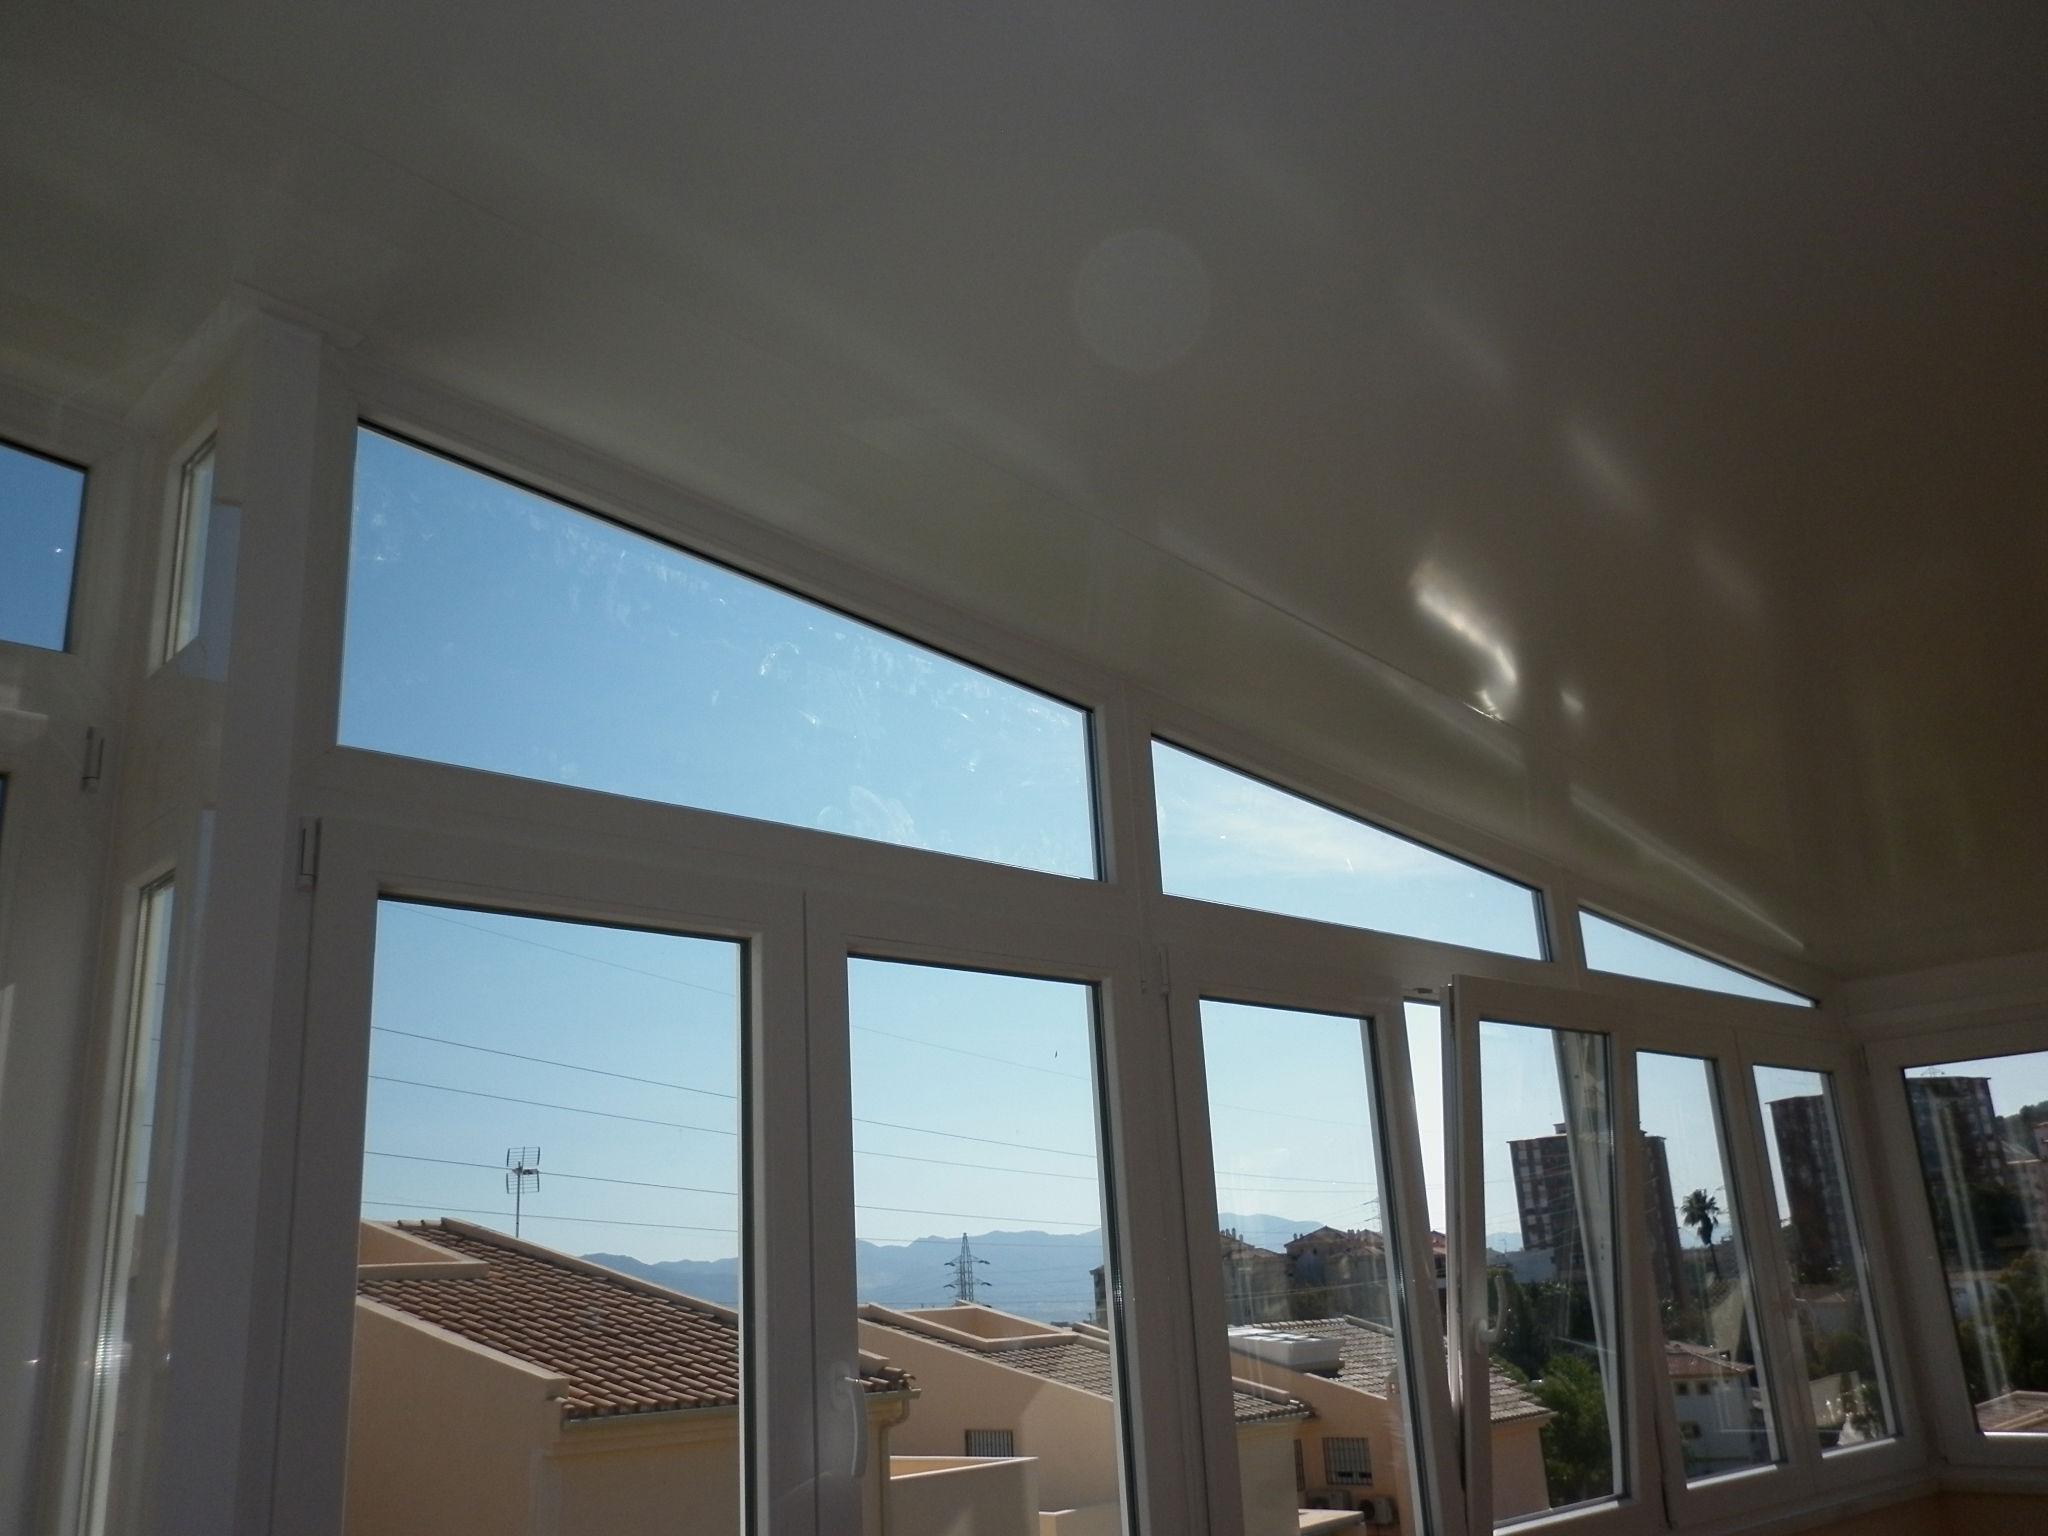 Foto 31 de Carpintería de aluminio, metálica y PVC en Málaga | Aluminios Alunoe